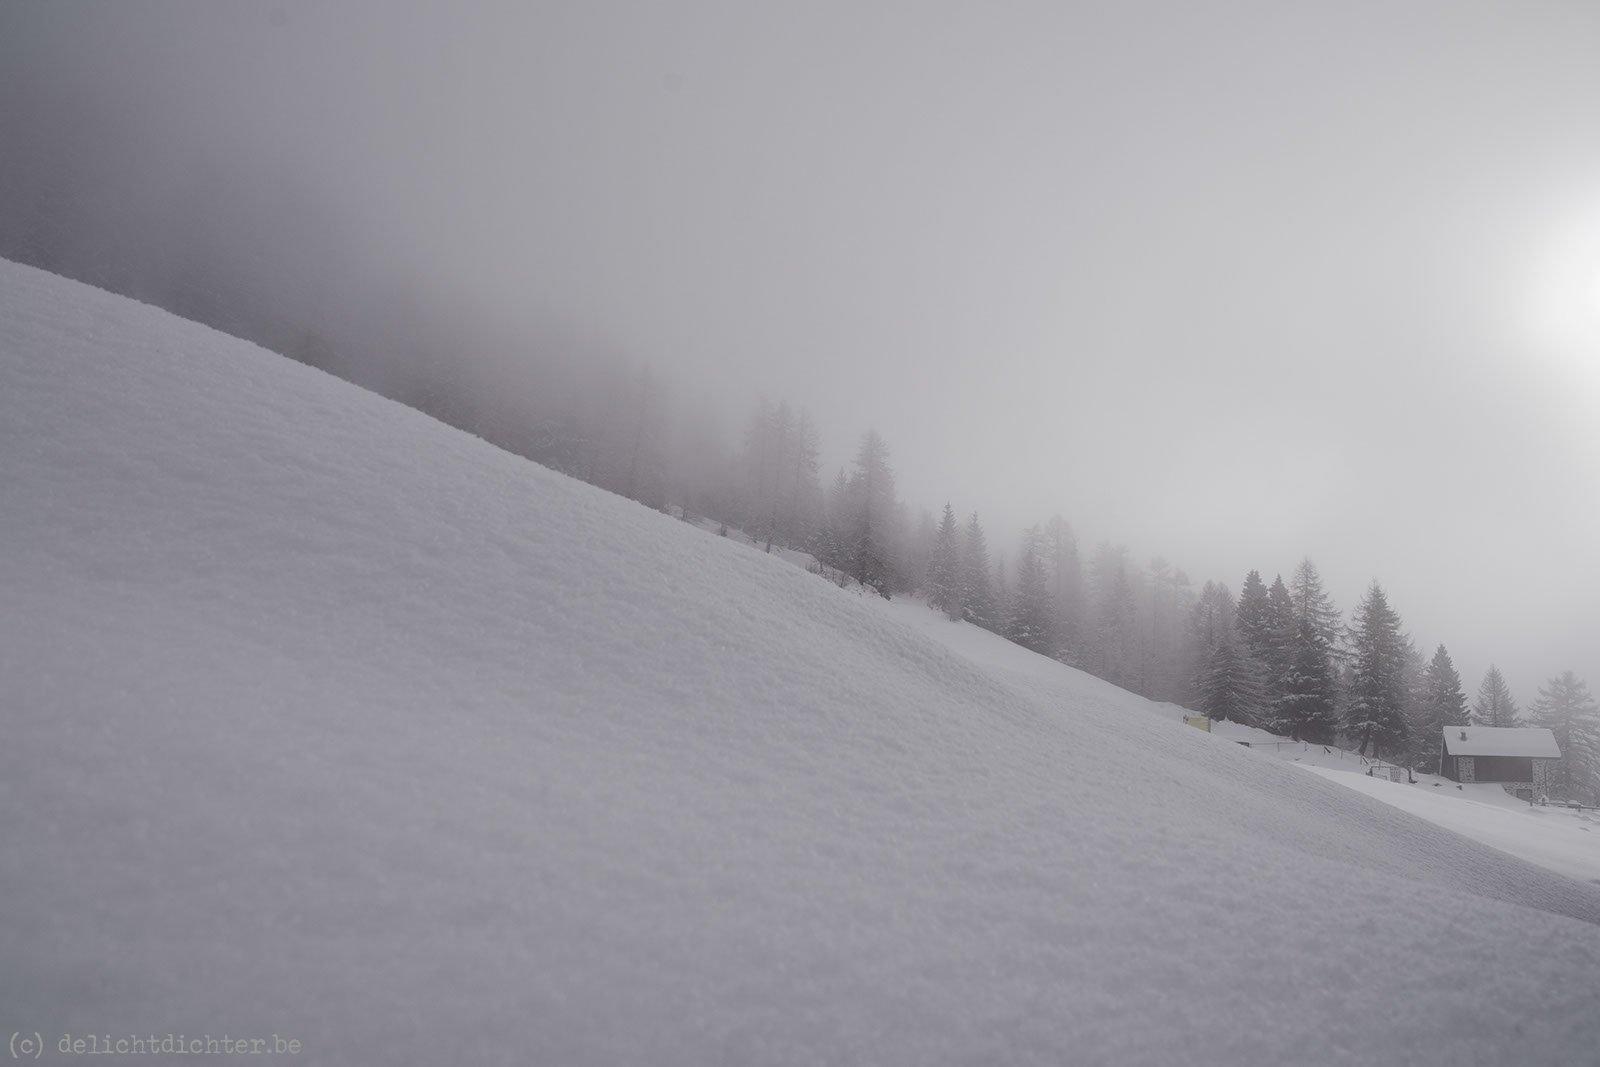 2013_12_sneeuwschoenen_20131229_115812_dxo_v9